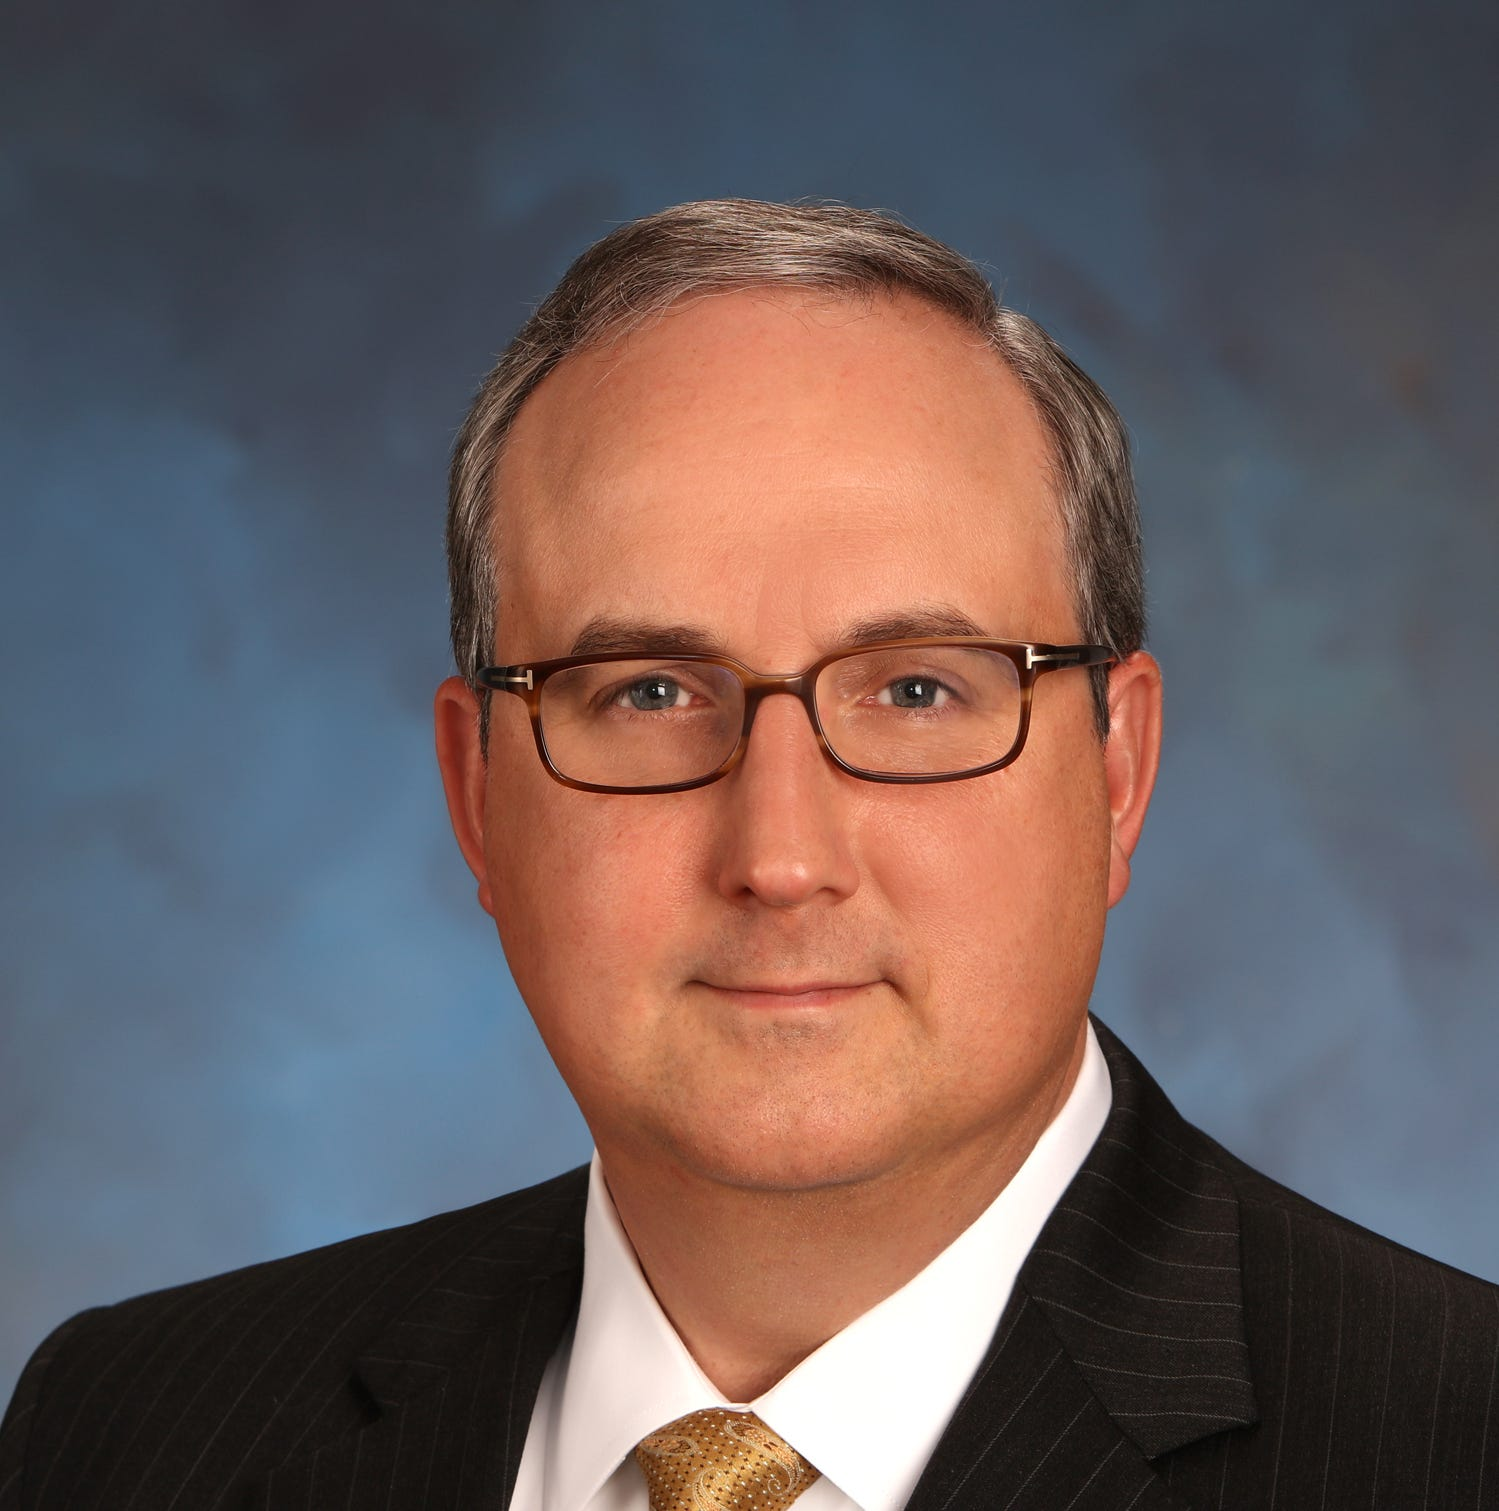 Stephen Raffaele is tapped to head Corpus Christi's American Bank